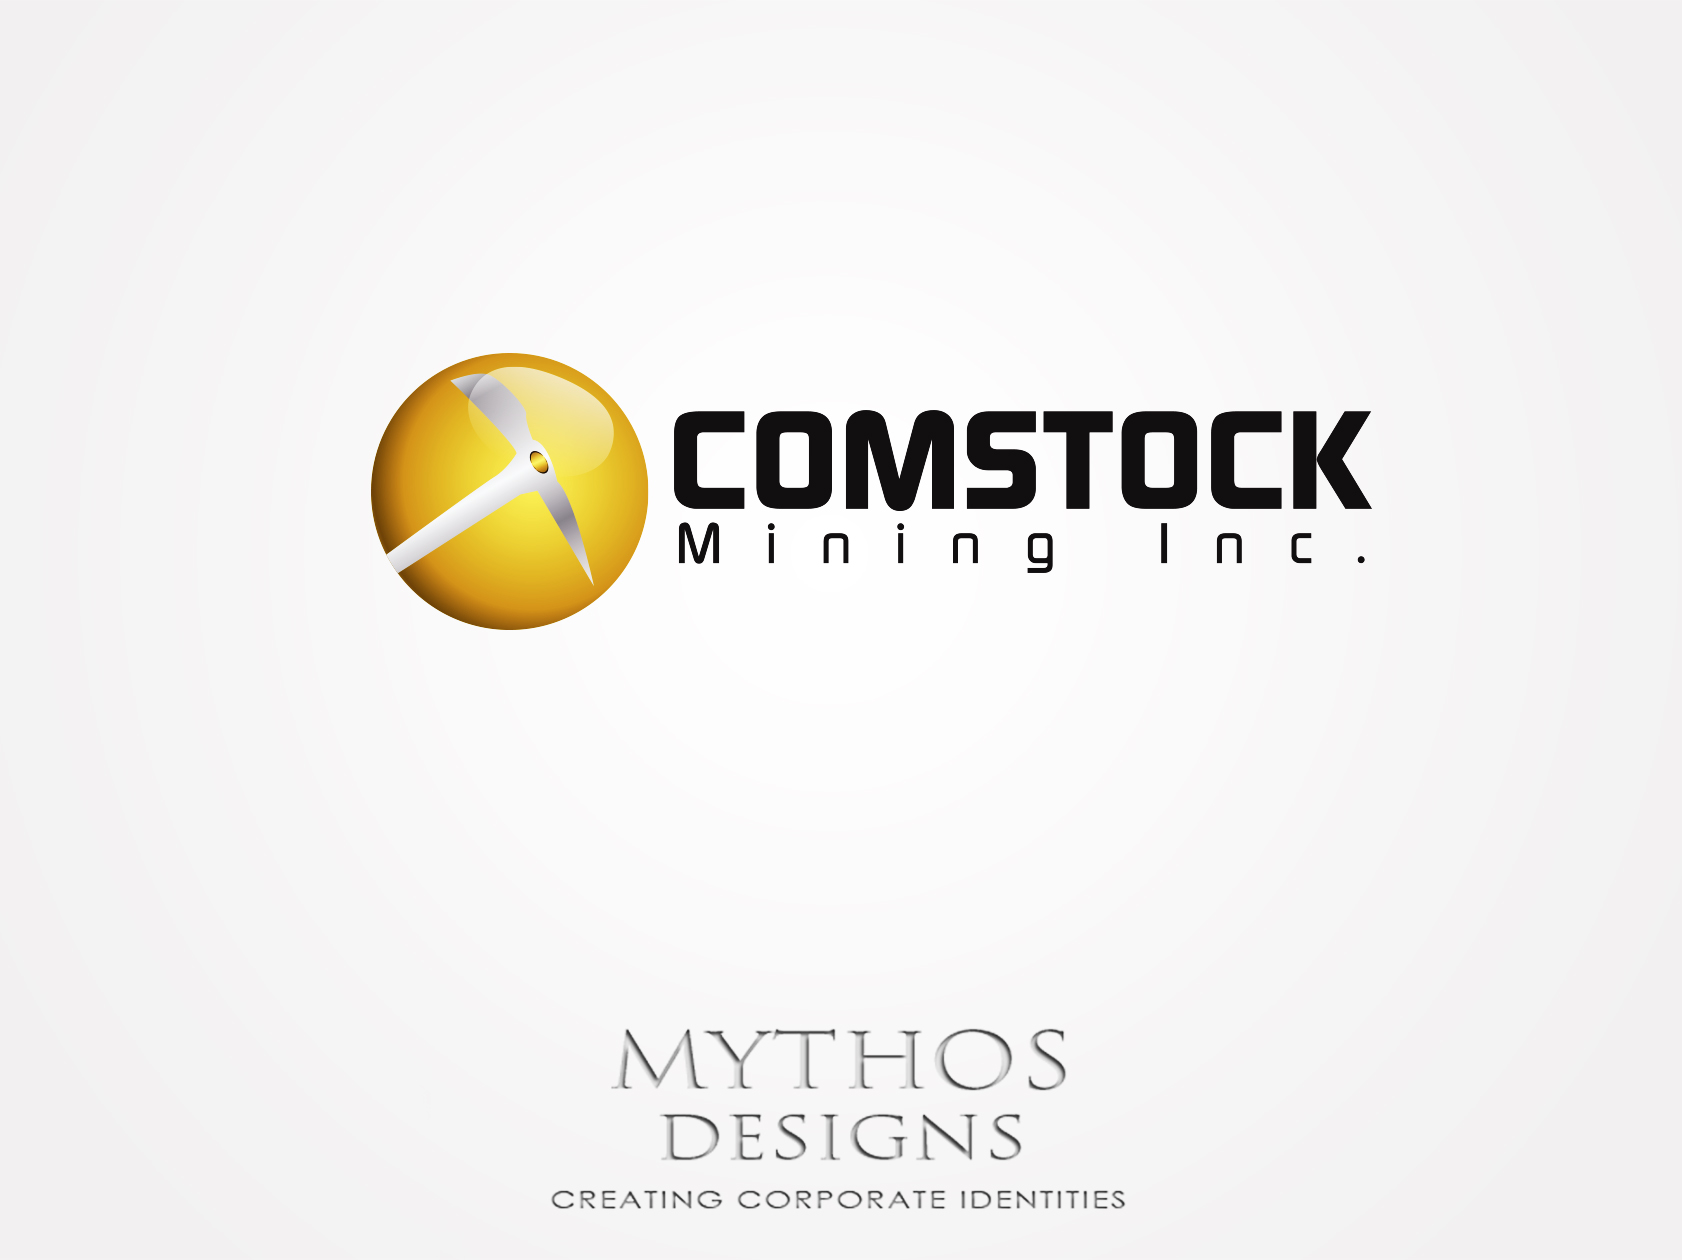 Logo Design by Mythos Designs - Entry No. 159 in the Logo Design Contest Captivating Logo Design for Comstock Mining, Inc..